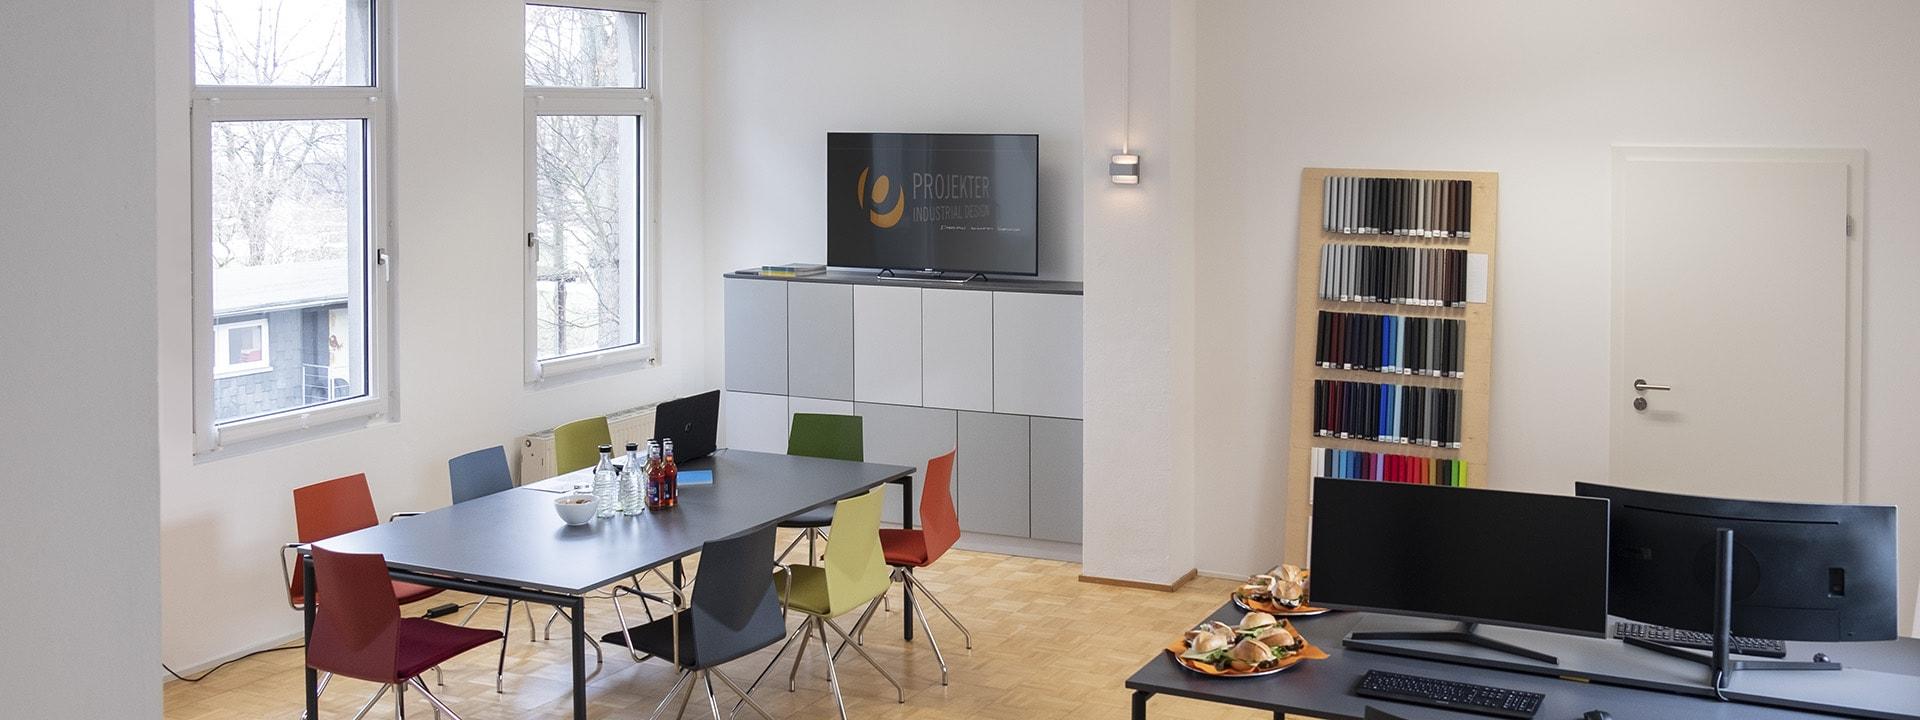 meetingraum_industrial-design_kreativagentur